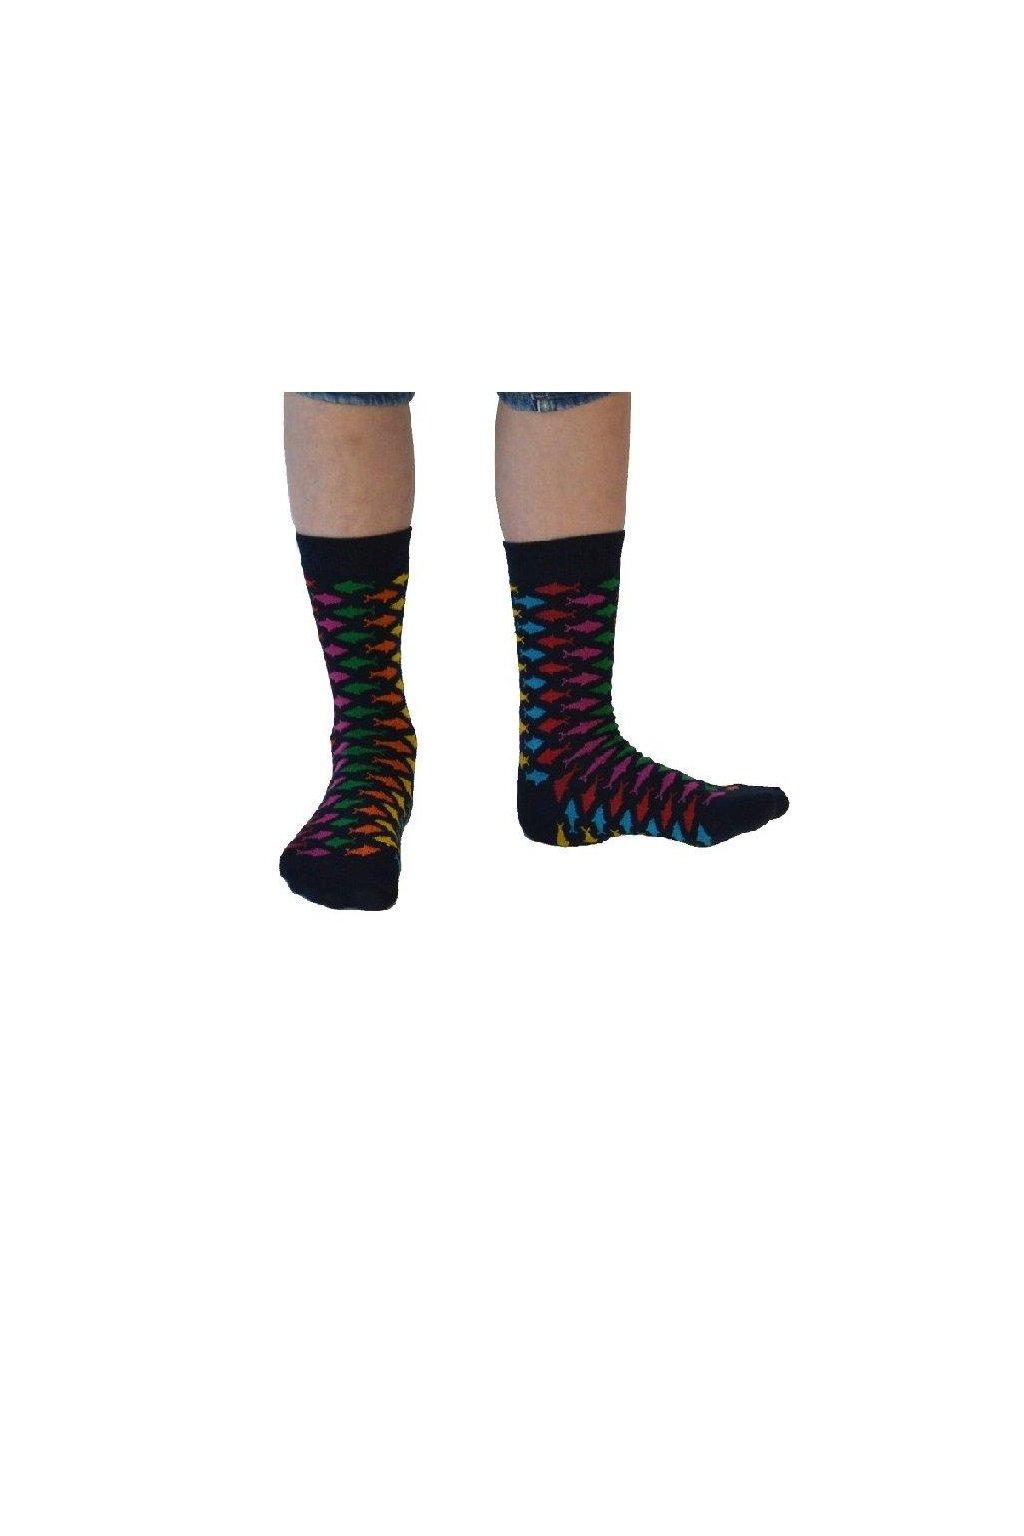 "Dětské ponožky z biobavlny ""Strömlund"" (Velikost 15-18)"